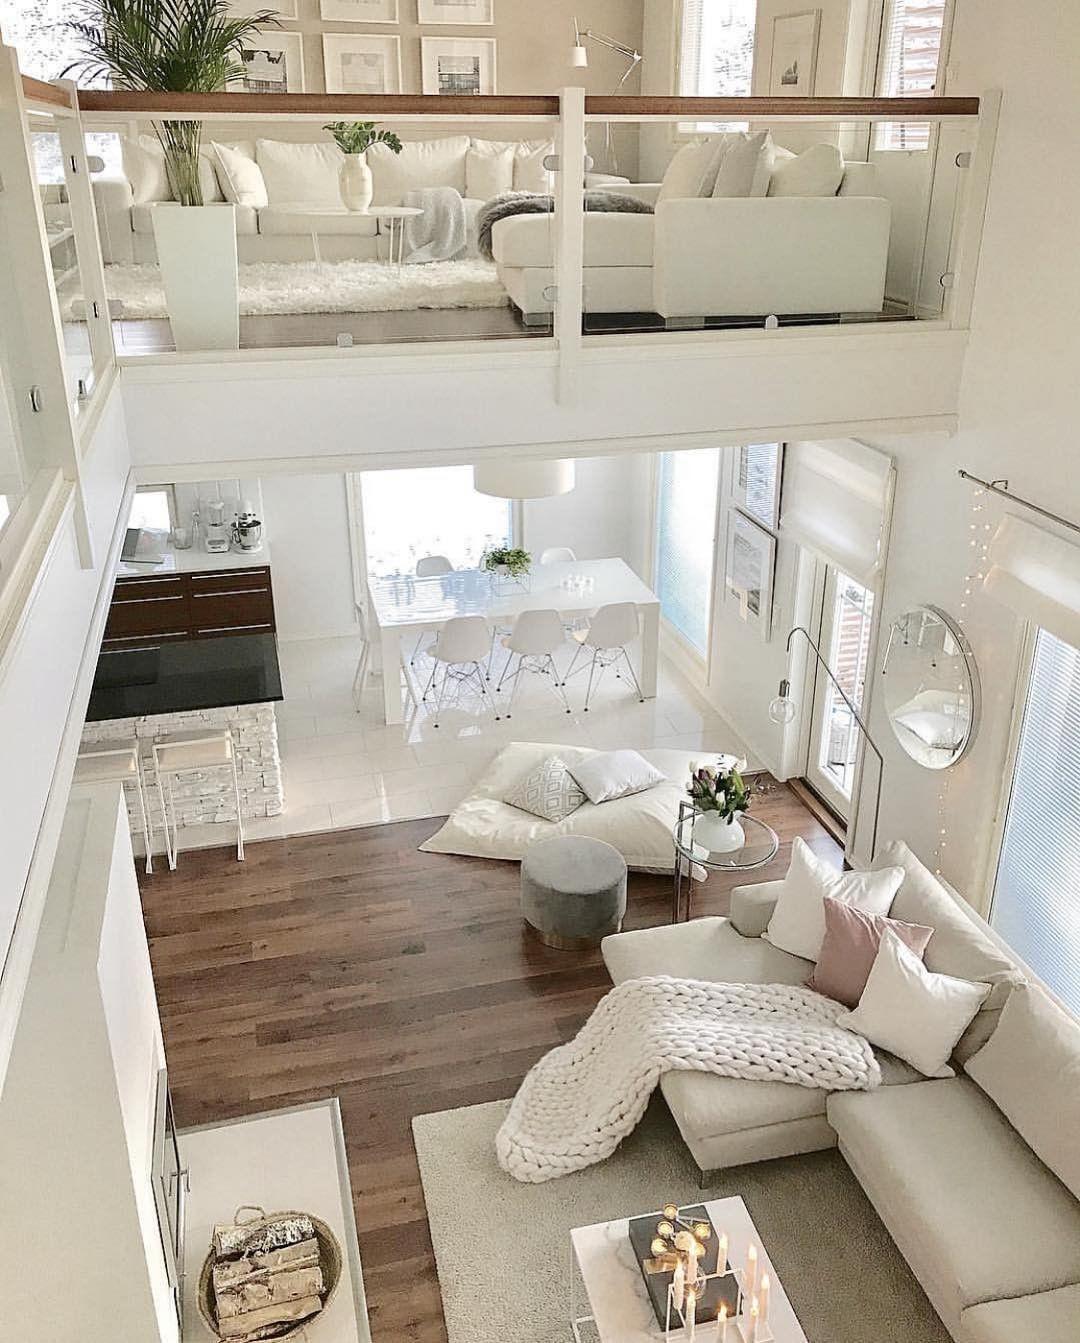 Interior Design Home Decor On Instagram Follow Us Interiorsandecor For More Daily Home Design Inspo Dream Home Design Modern House Design House Interior